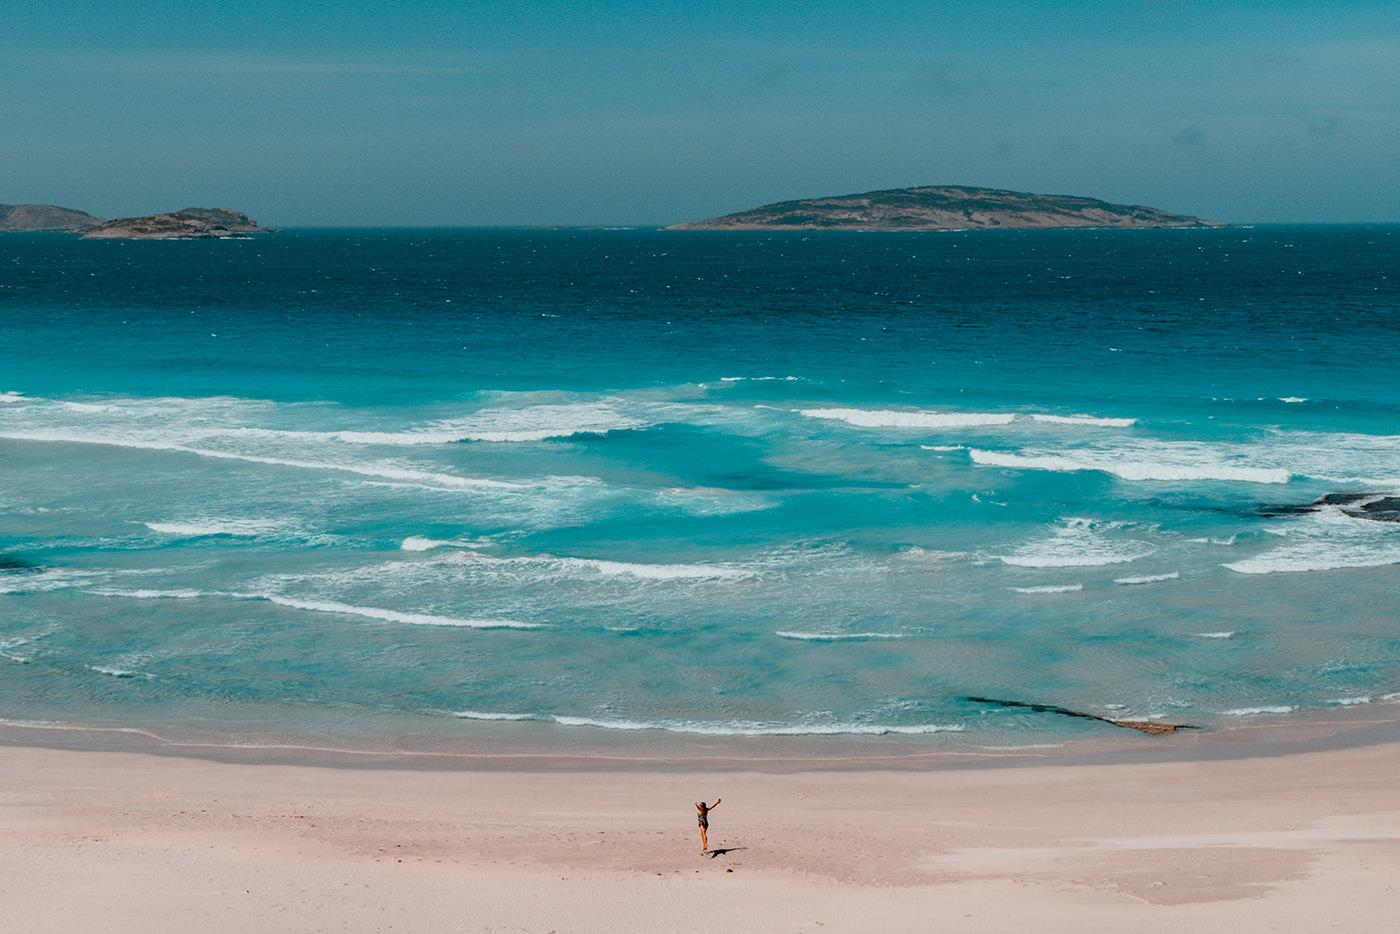 Ausblick aufs Meer bei Esperance in Australien